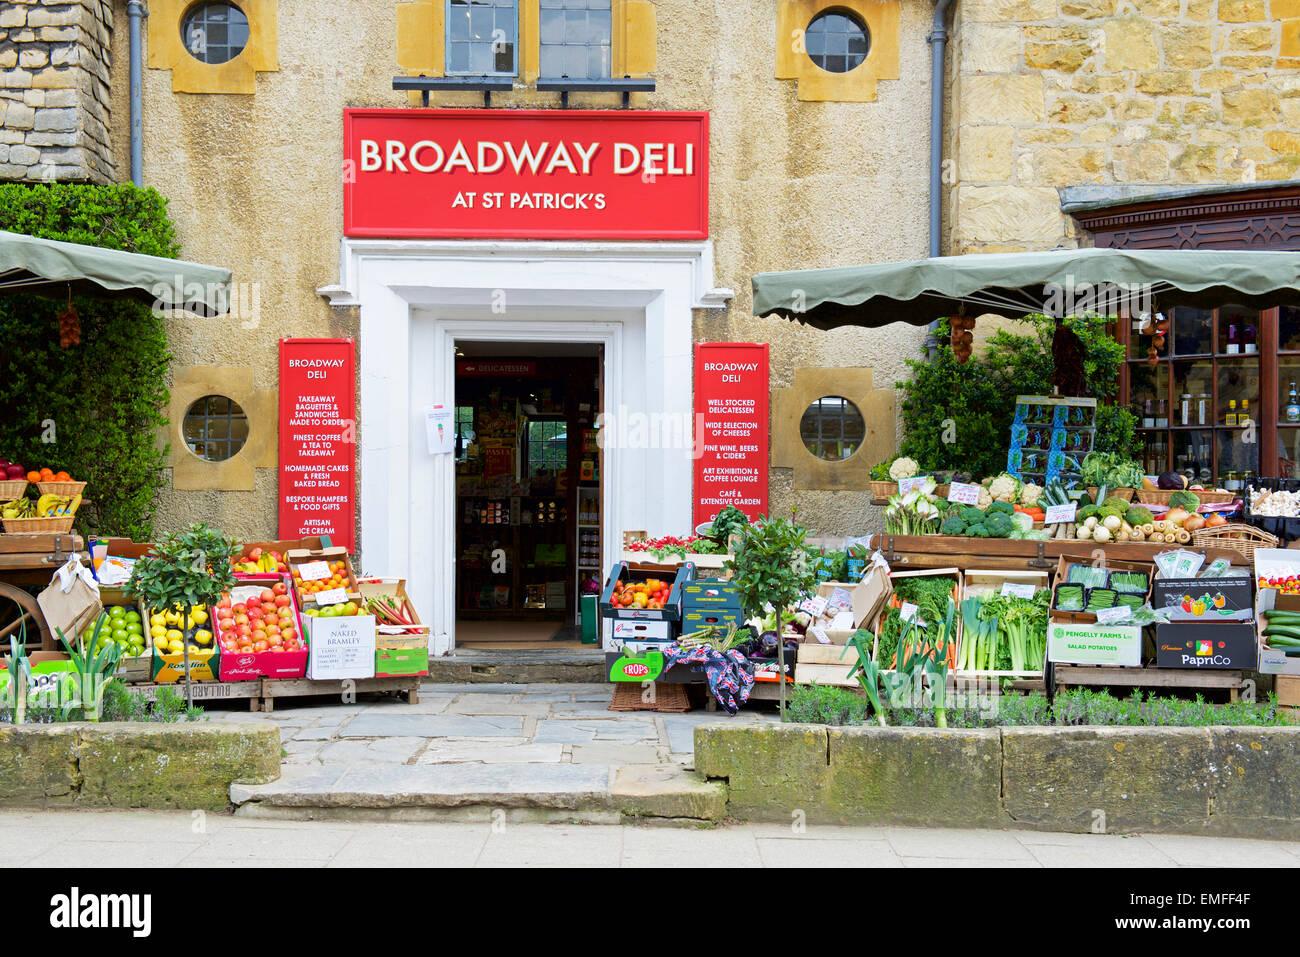 The Broadway Deli, Broadway, Worcestershire, England UK - Stock Image